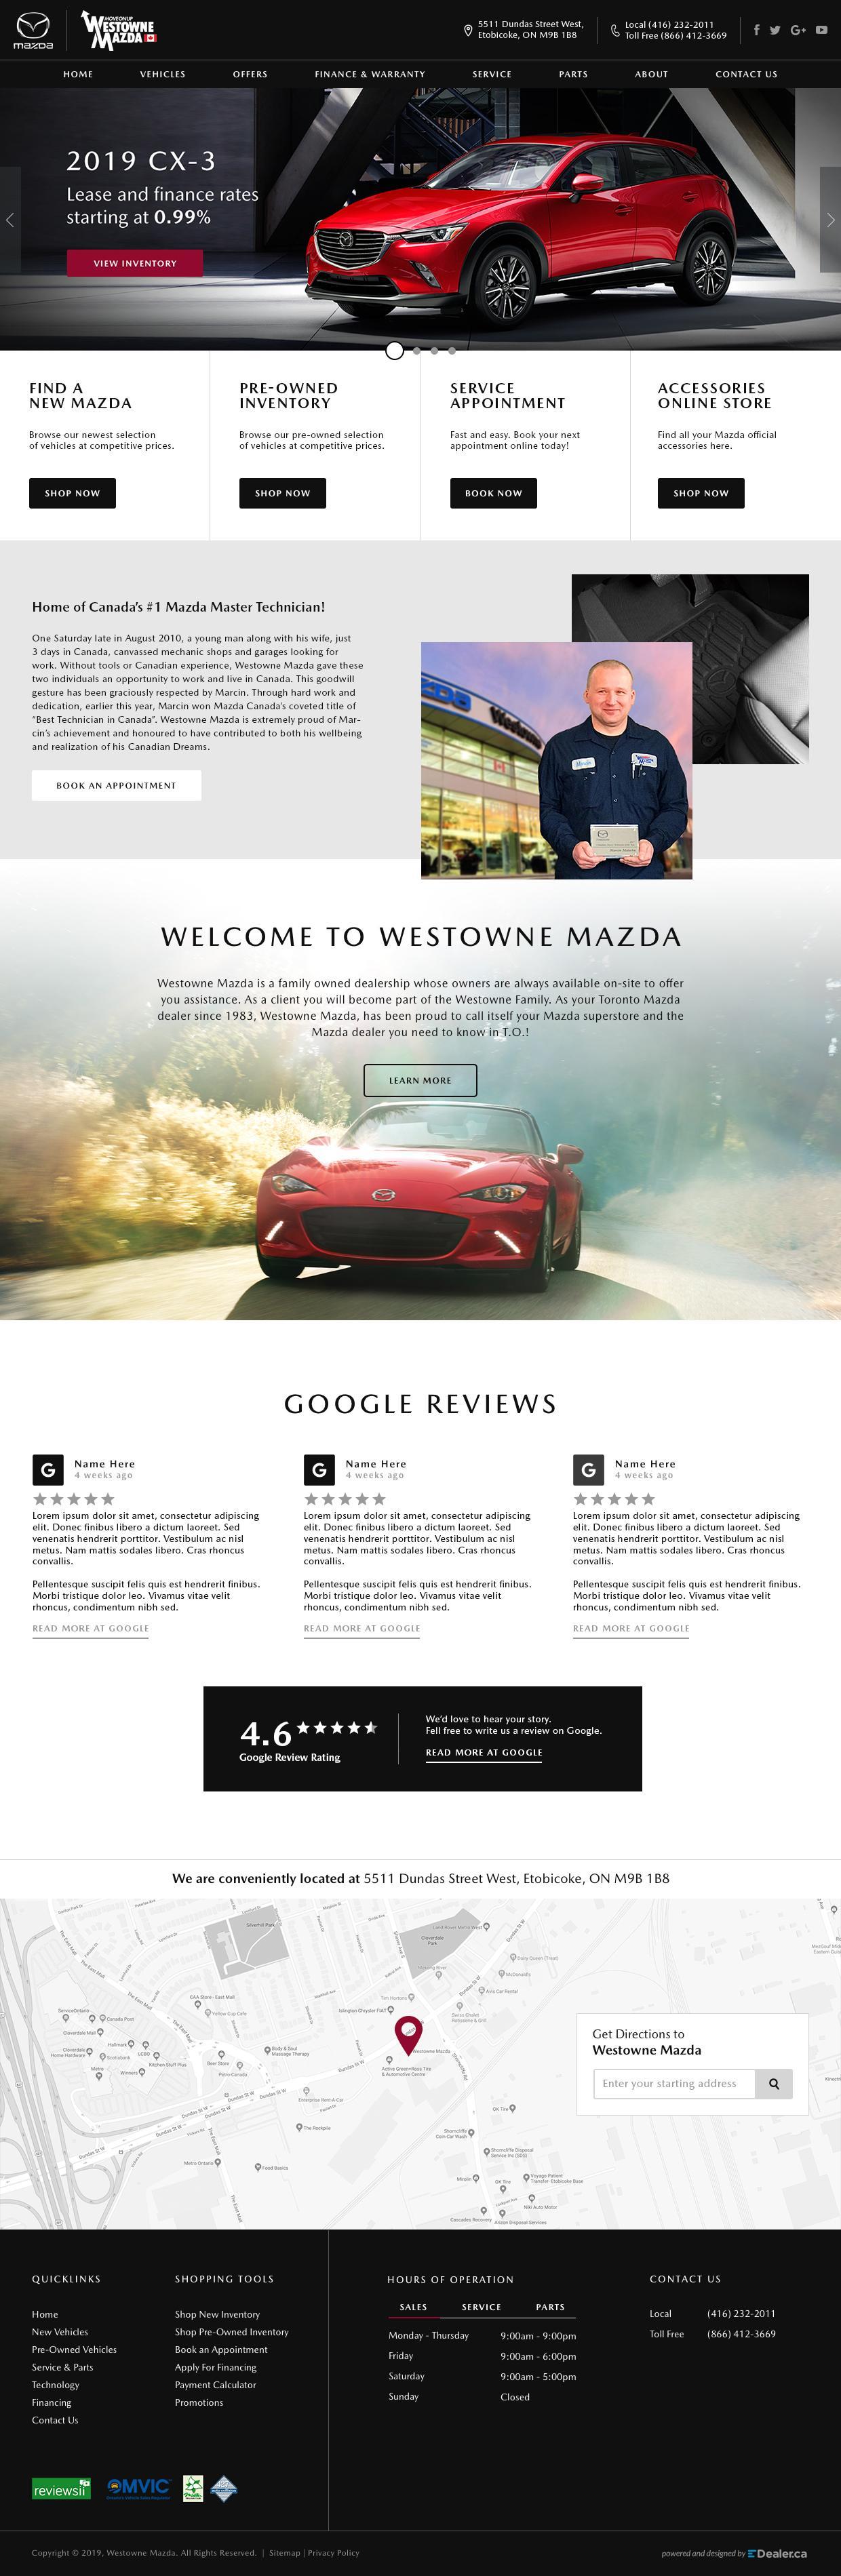 Westowne Mazda